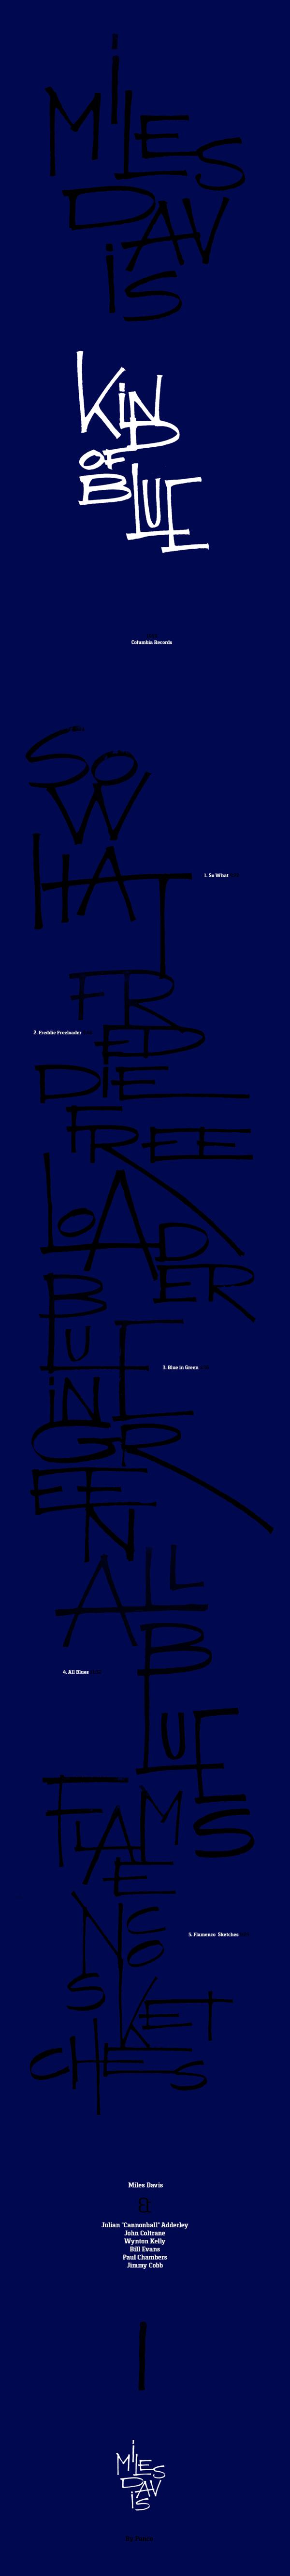 Kind of Blue – Miles Davis